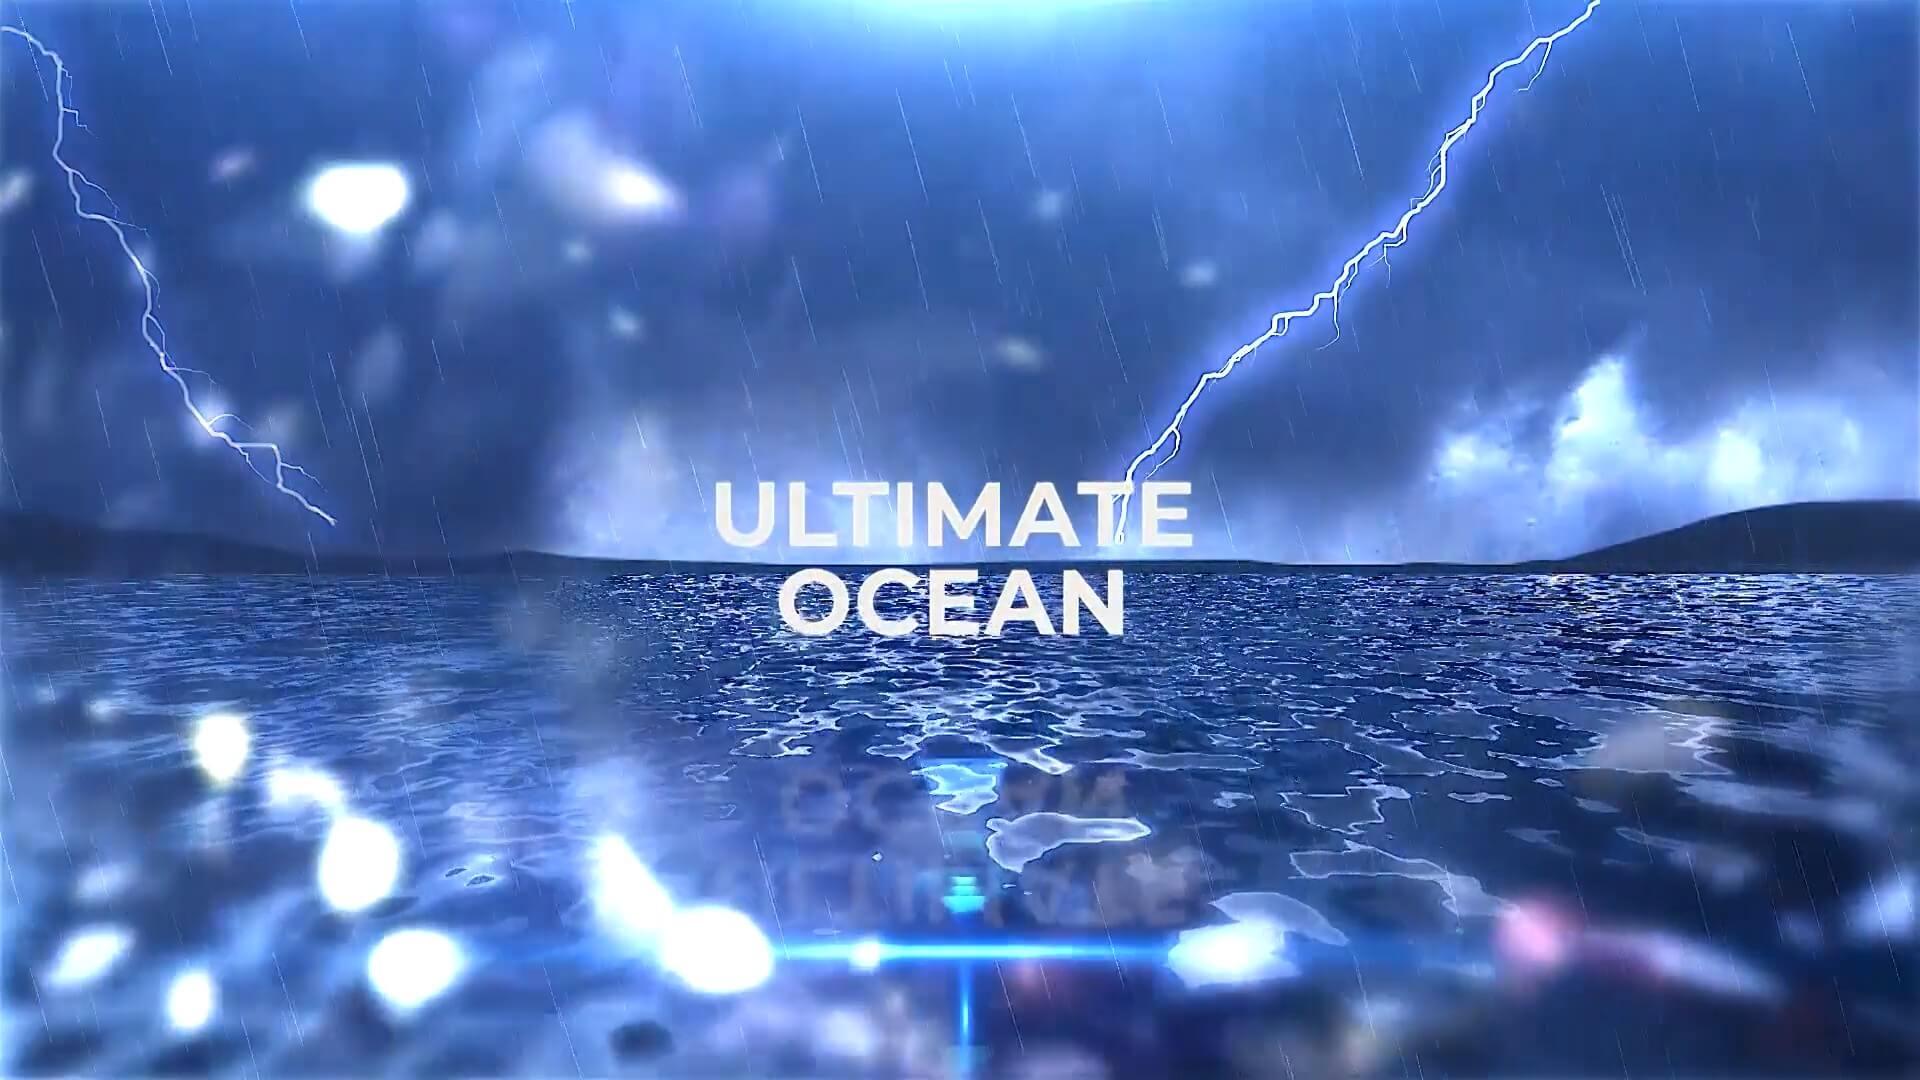 fcpx插件 大气海洋主题电影预告片片头模板 Ultimate Ocean for Credits